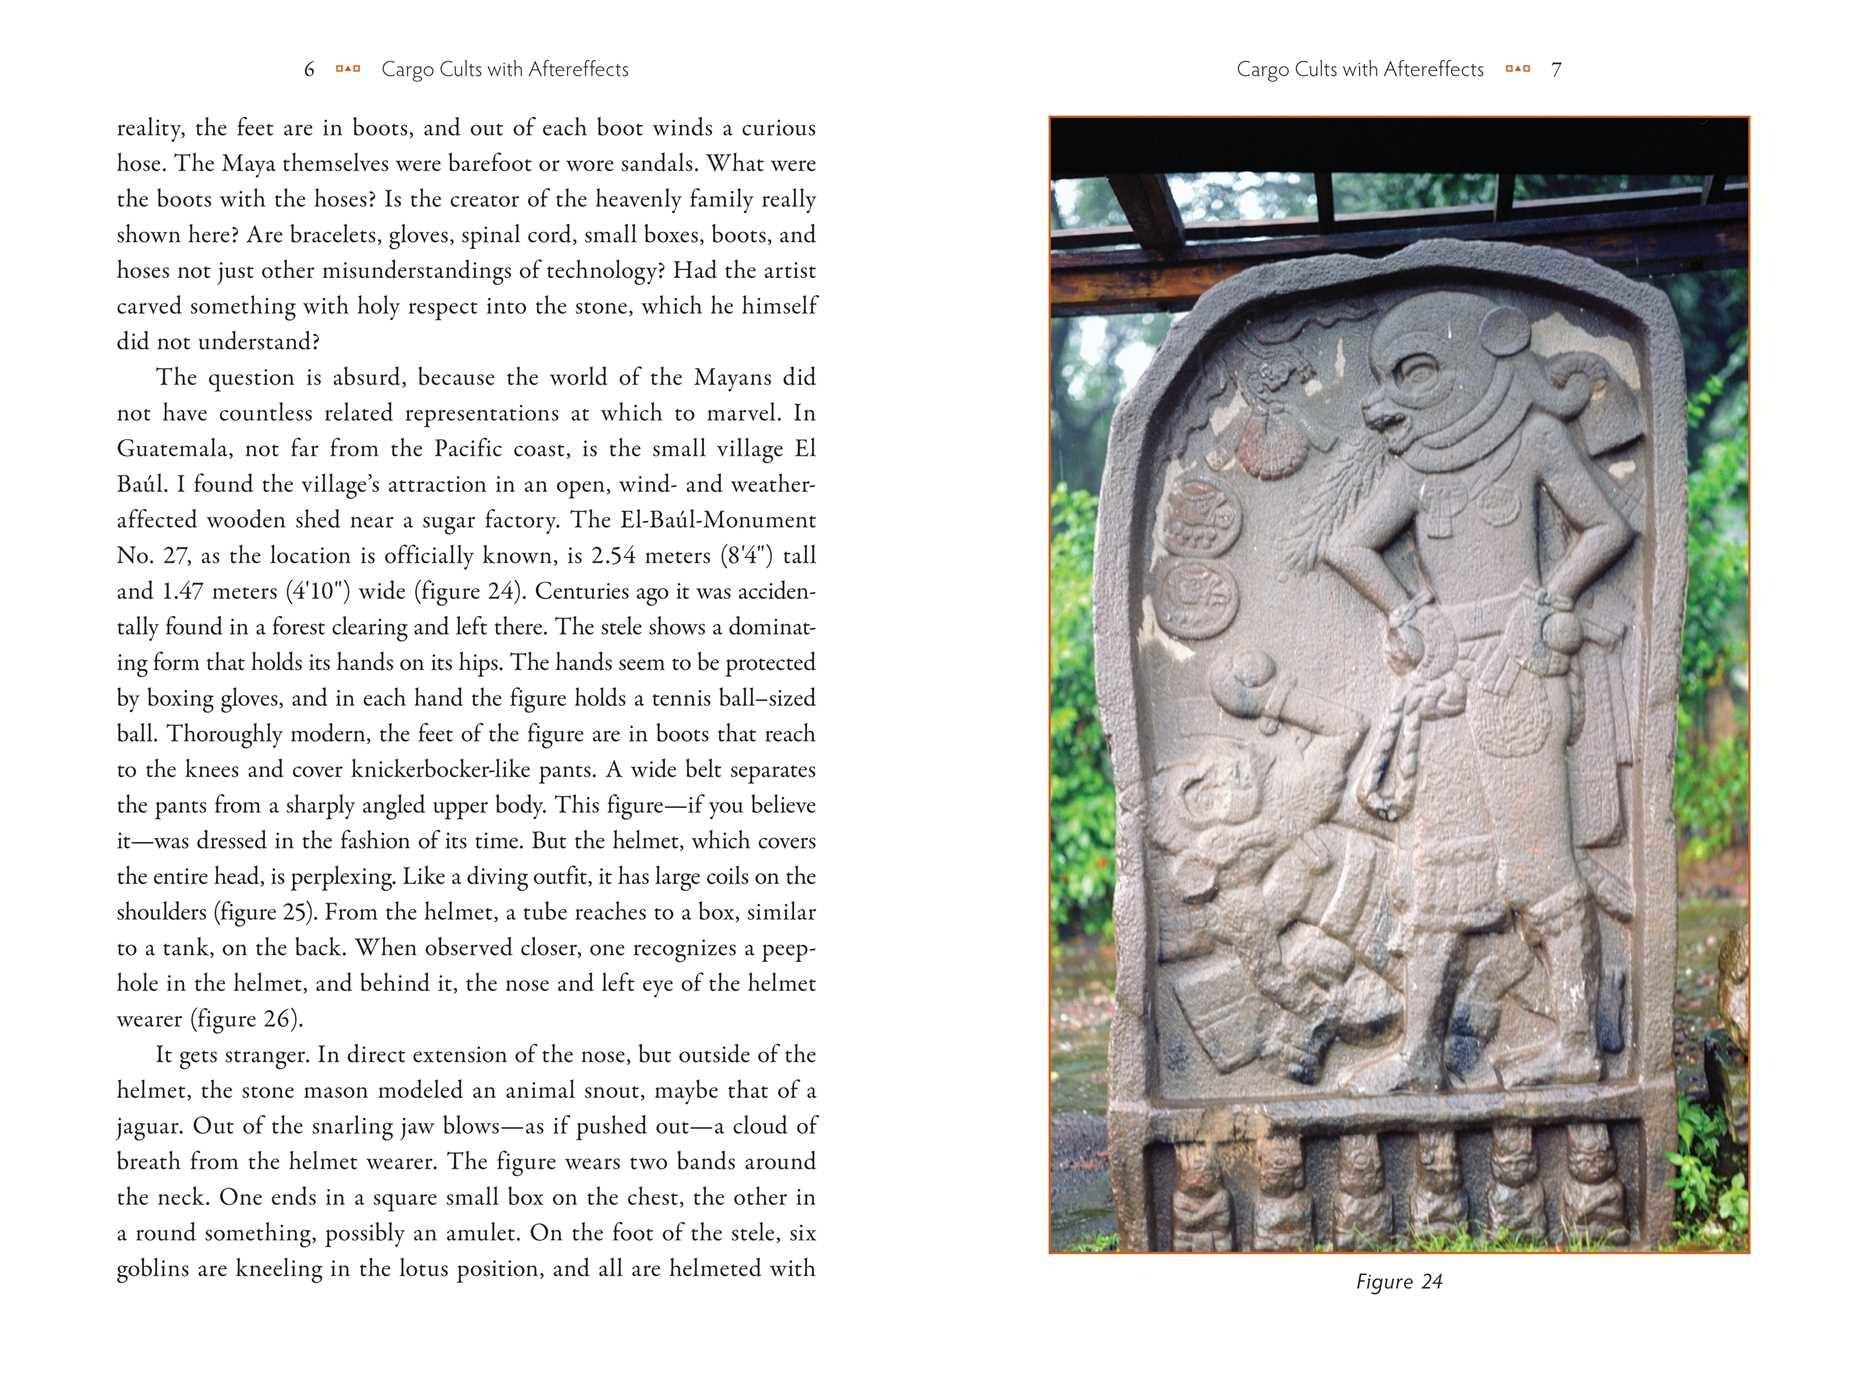 Astronaut gods of the maya 9781591432357.in03